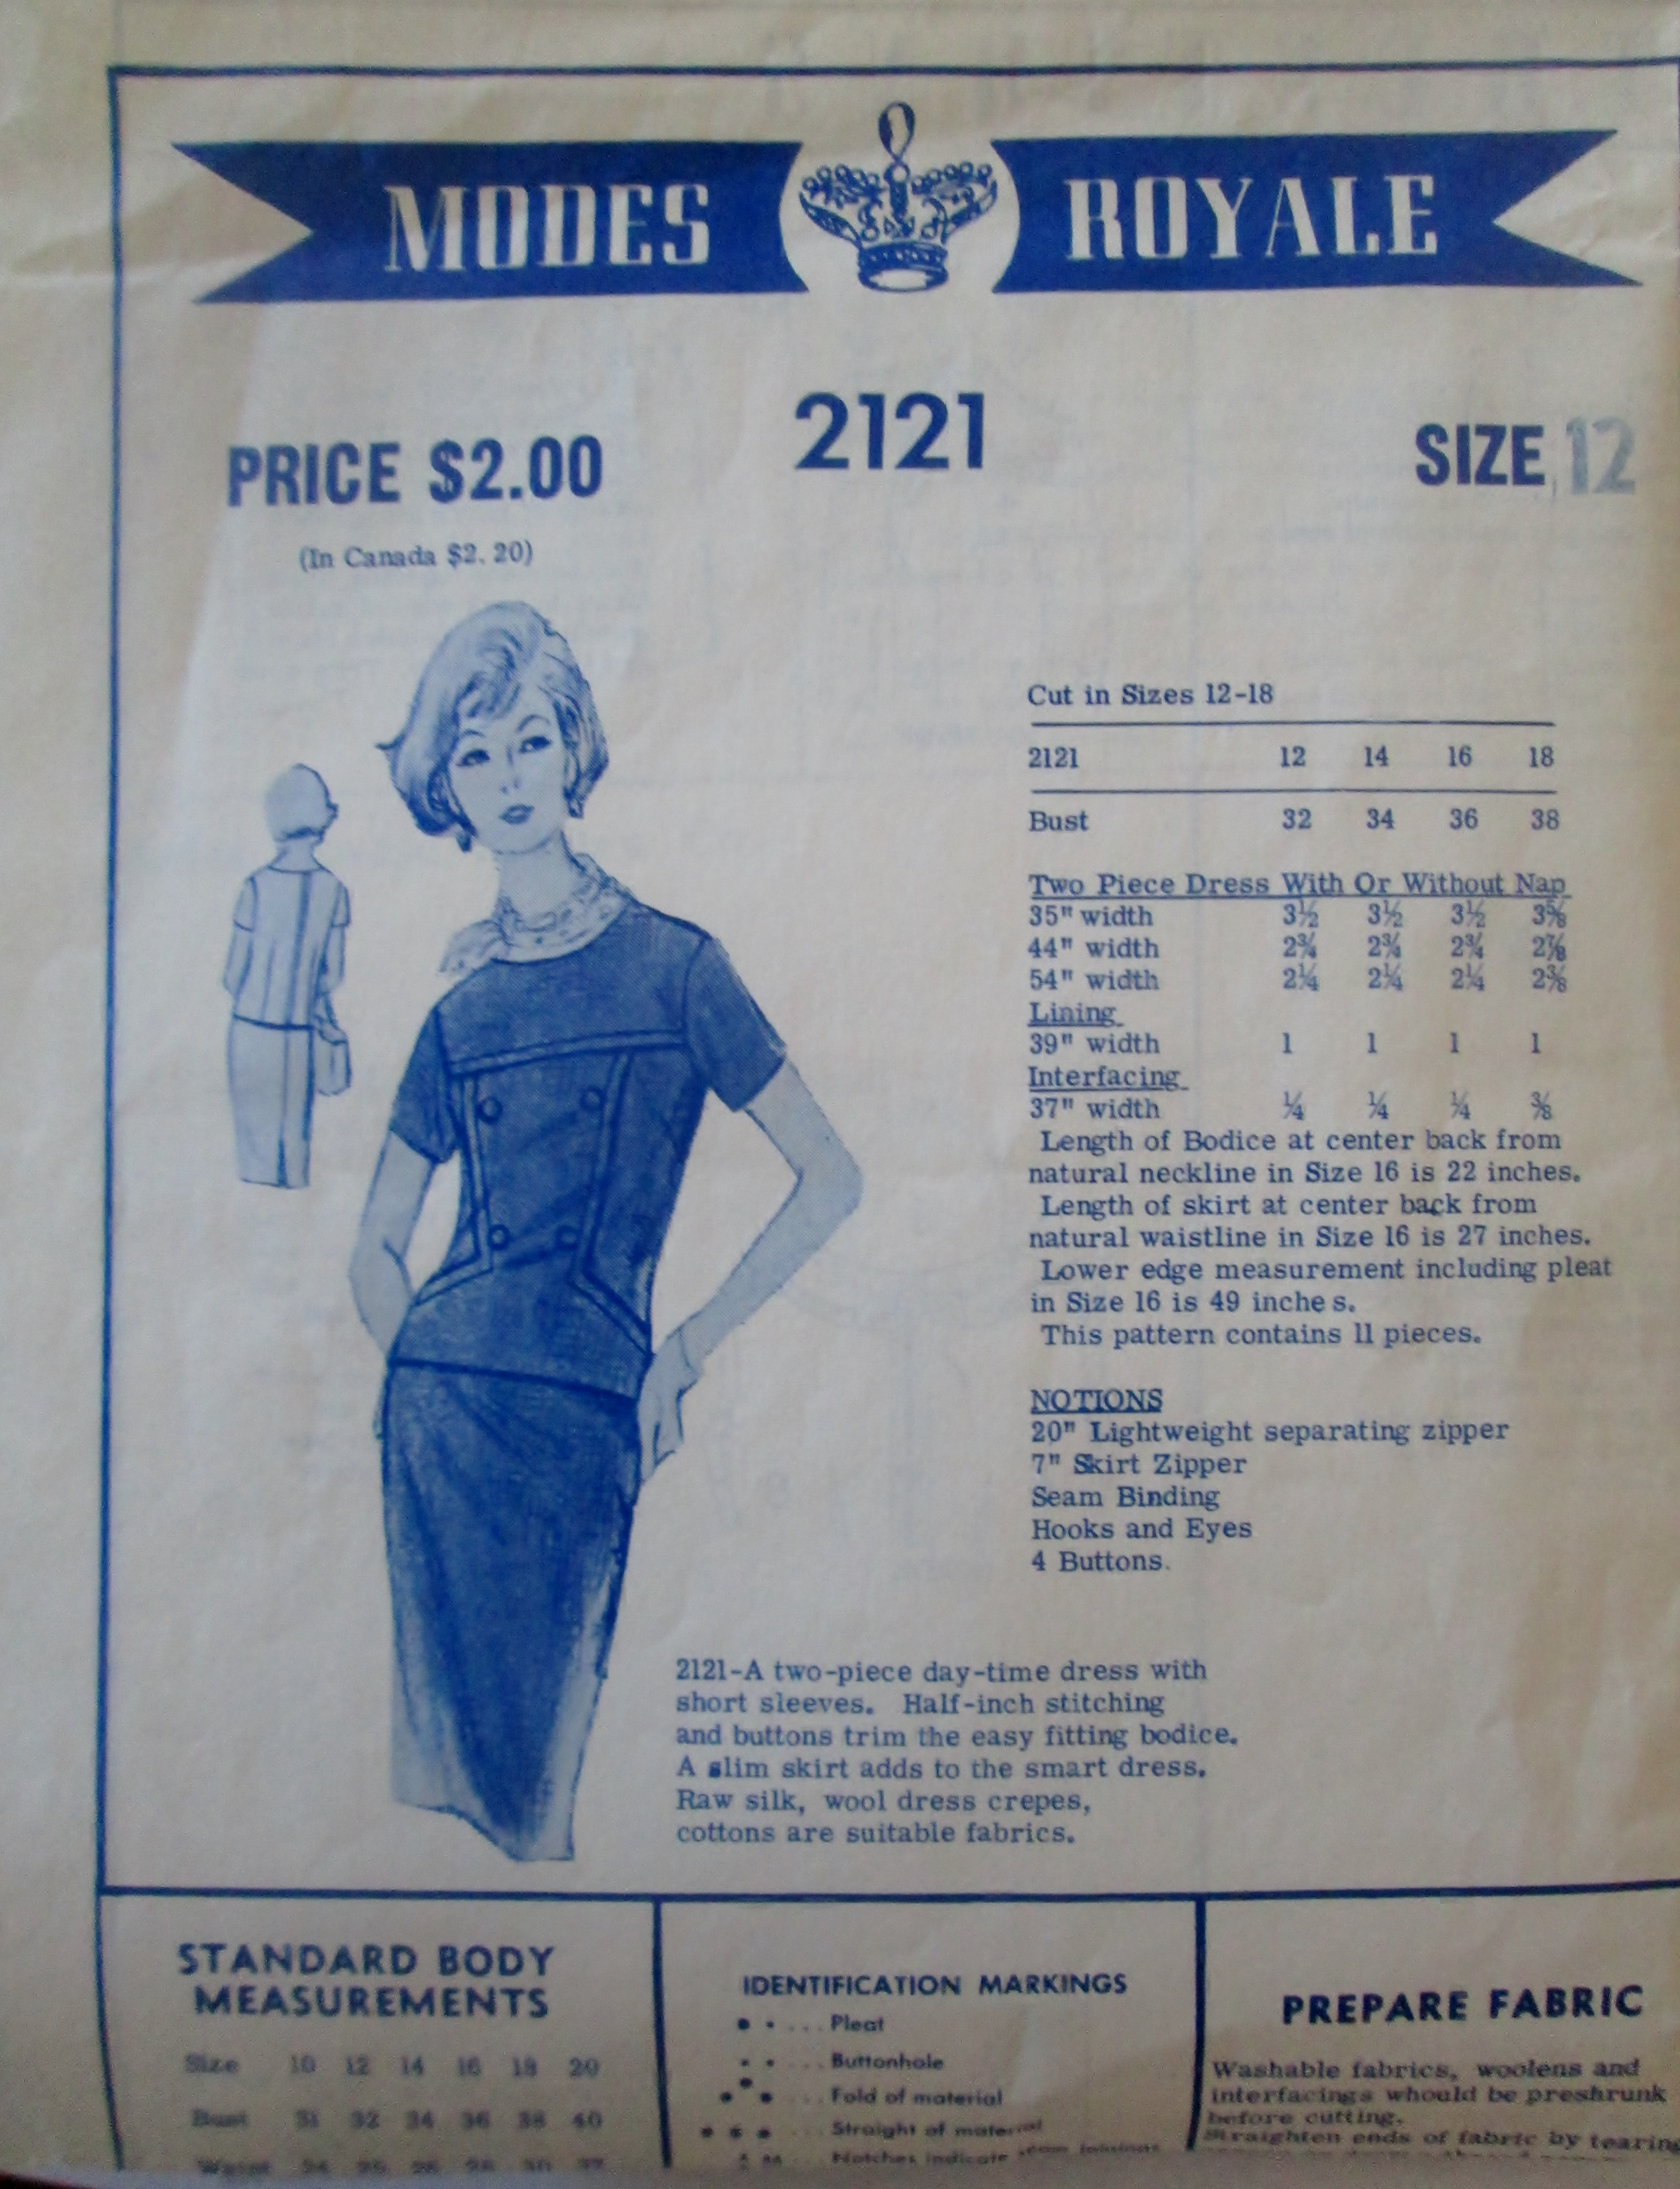 Modes Royale 2121